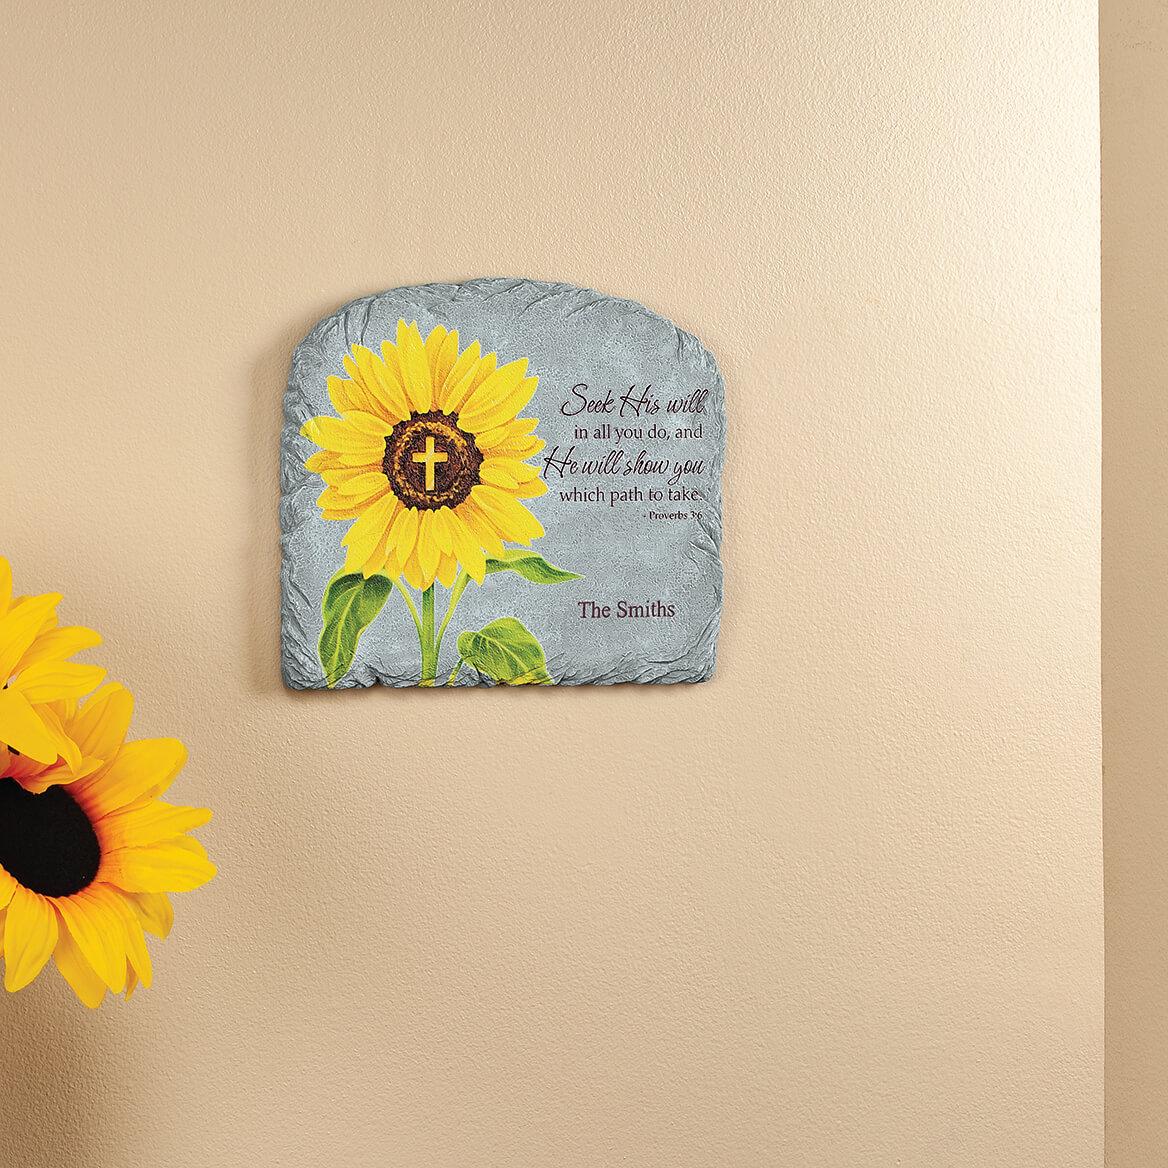 Personalized Sunflower Proverbs 3:6 Garden Stone-371655